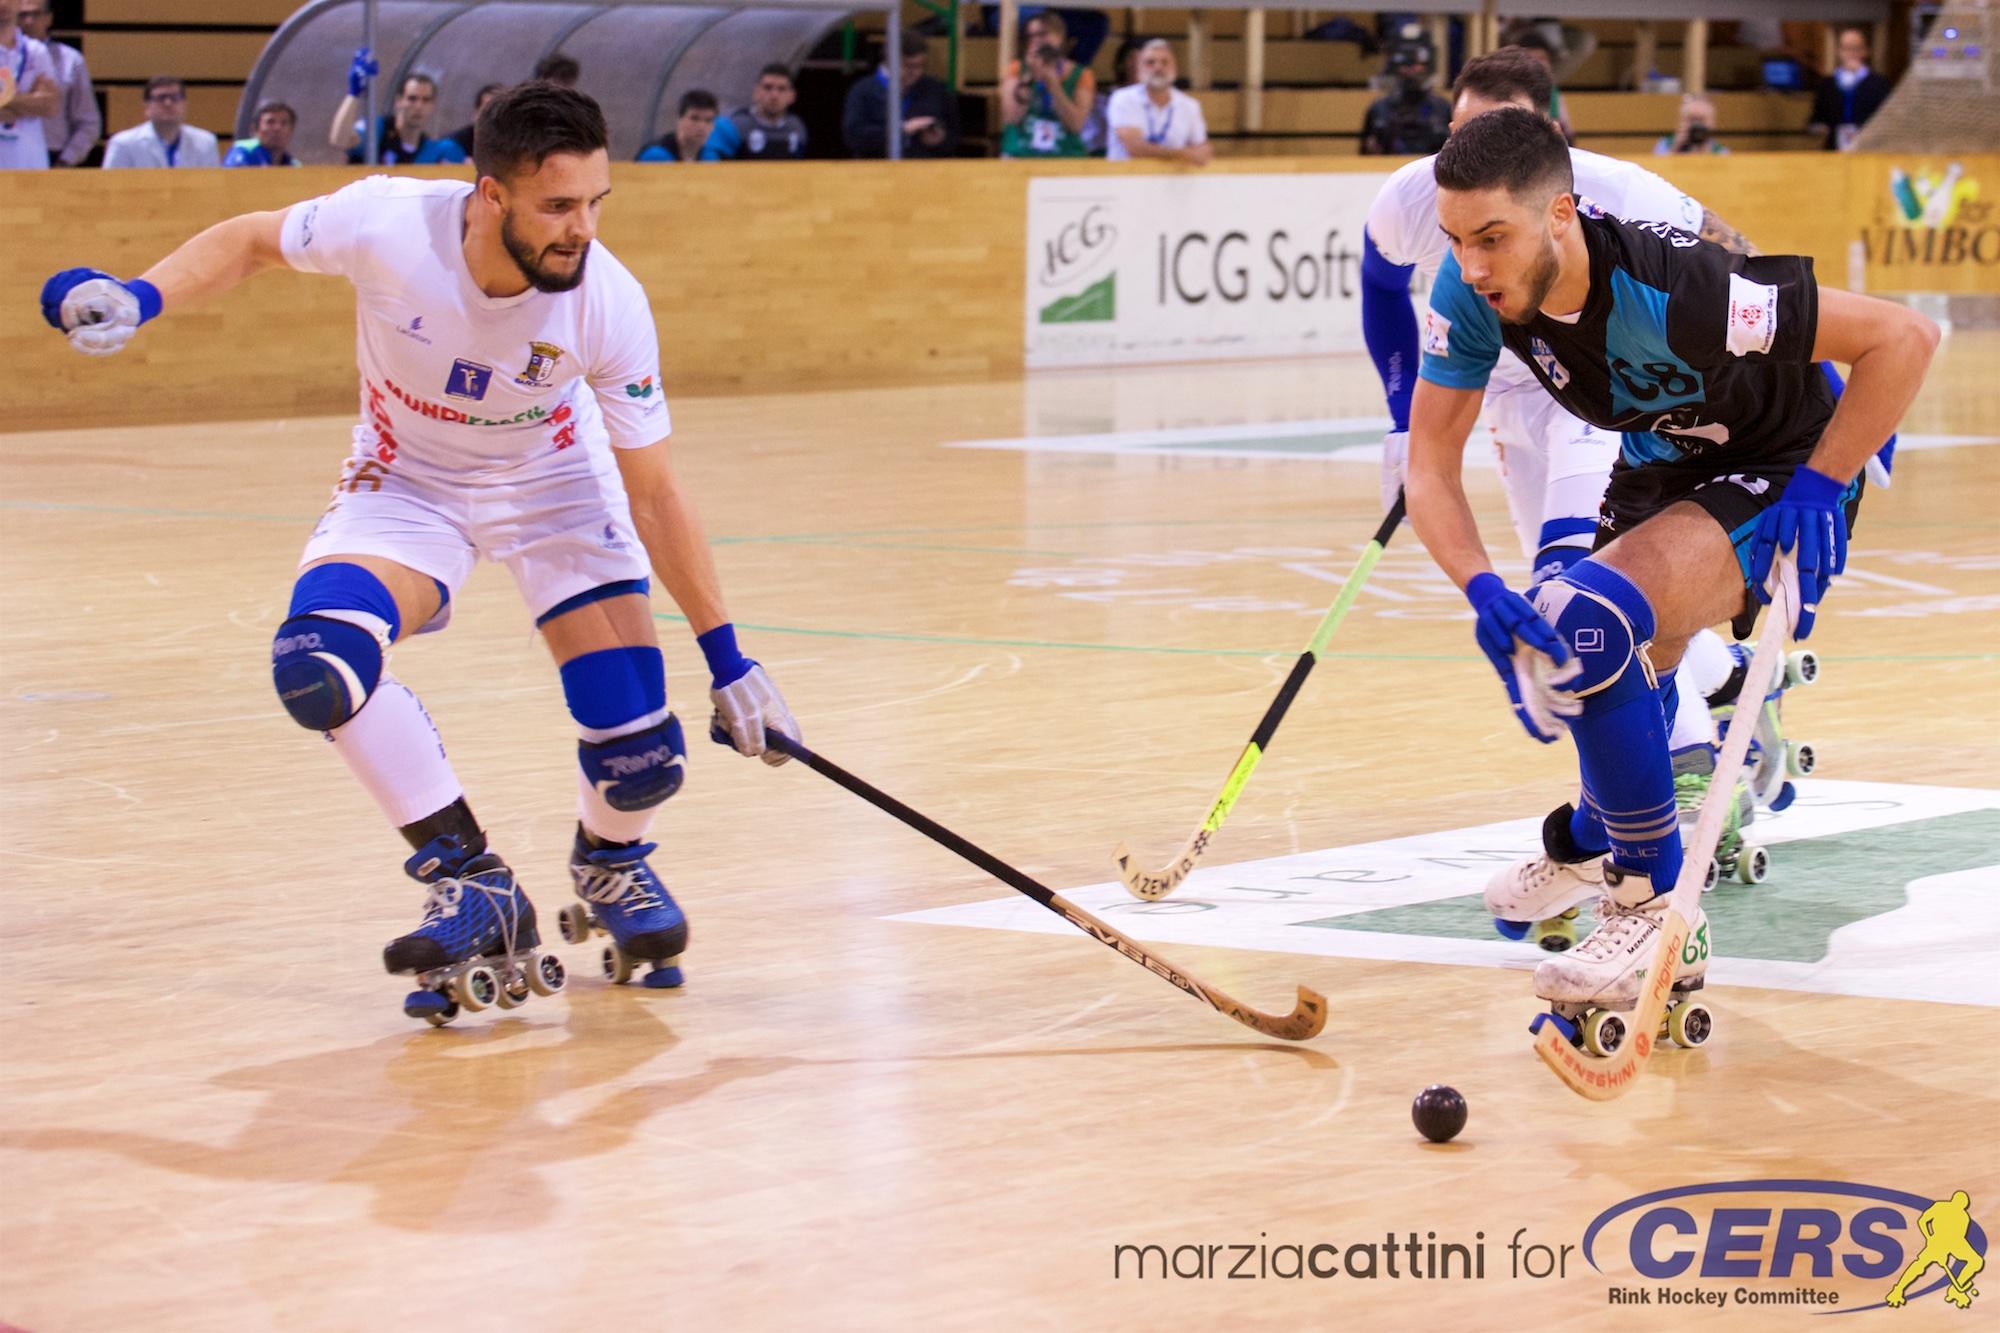 PHOTOS – 28/04/2018 – CERS CUP – Match #121 – Final – OC Barcelos (PT) x Lleida Llista (SP) – Photos by Marzia Cattini